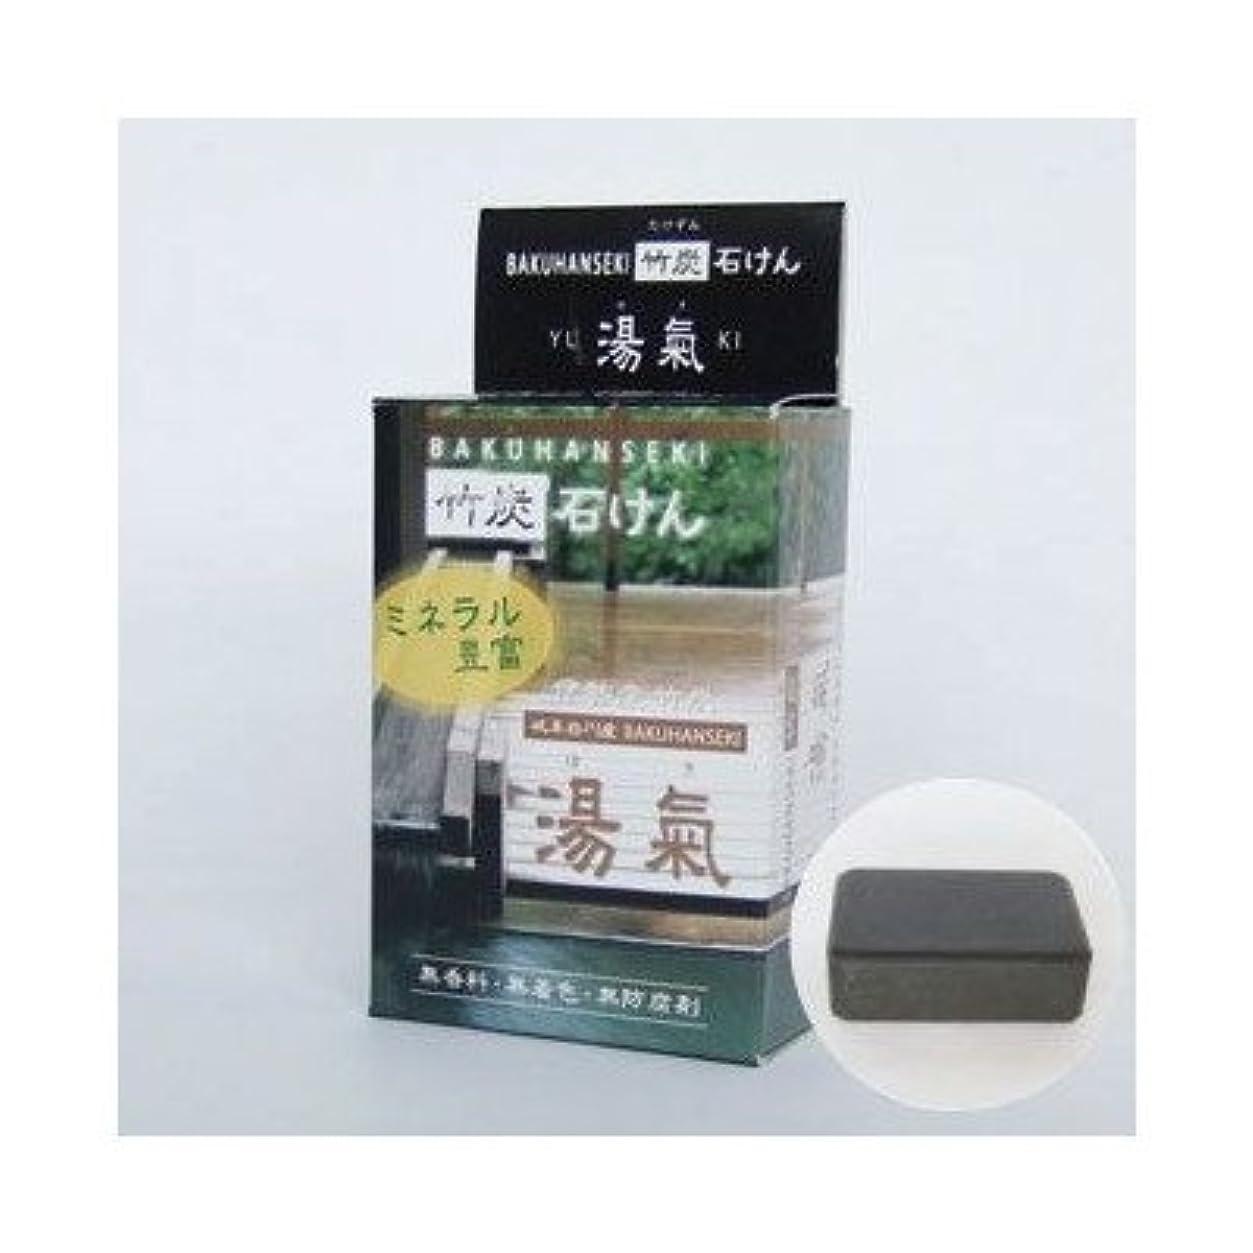 建物橋脚敏感な麦飯石竹炭石鹸 湯気 2個セット